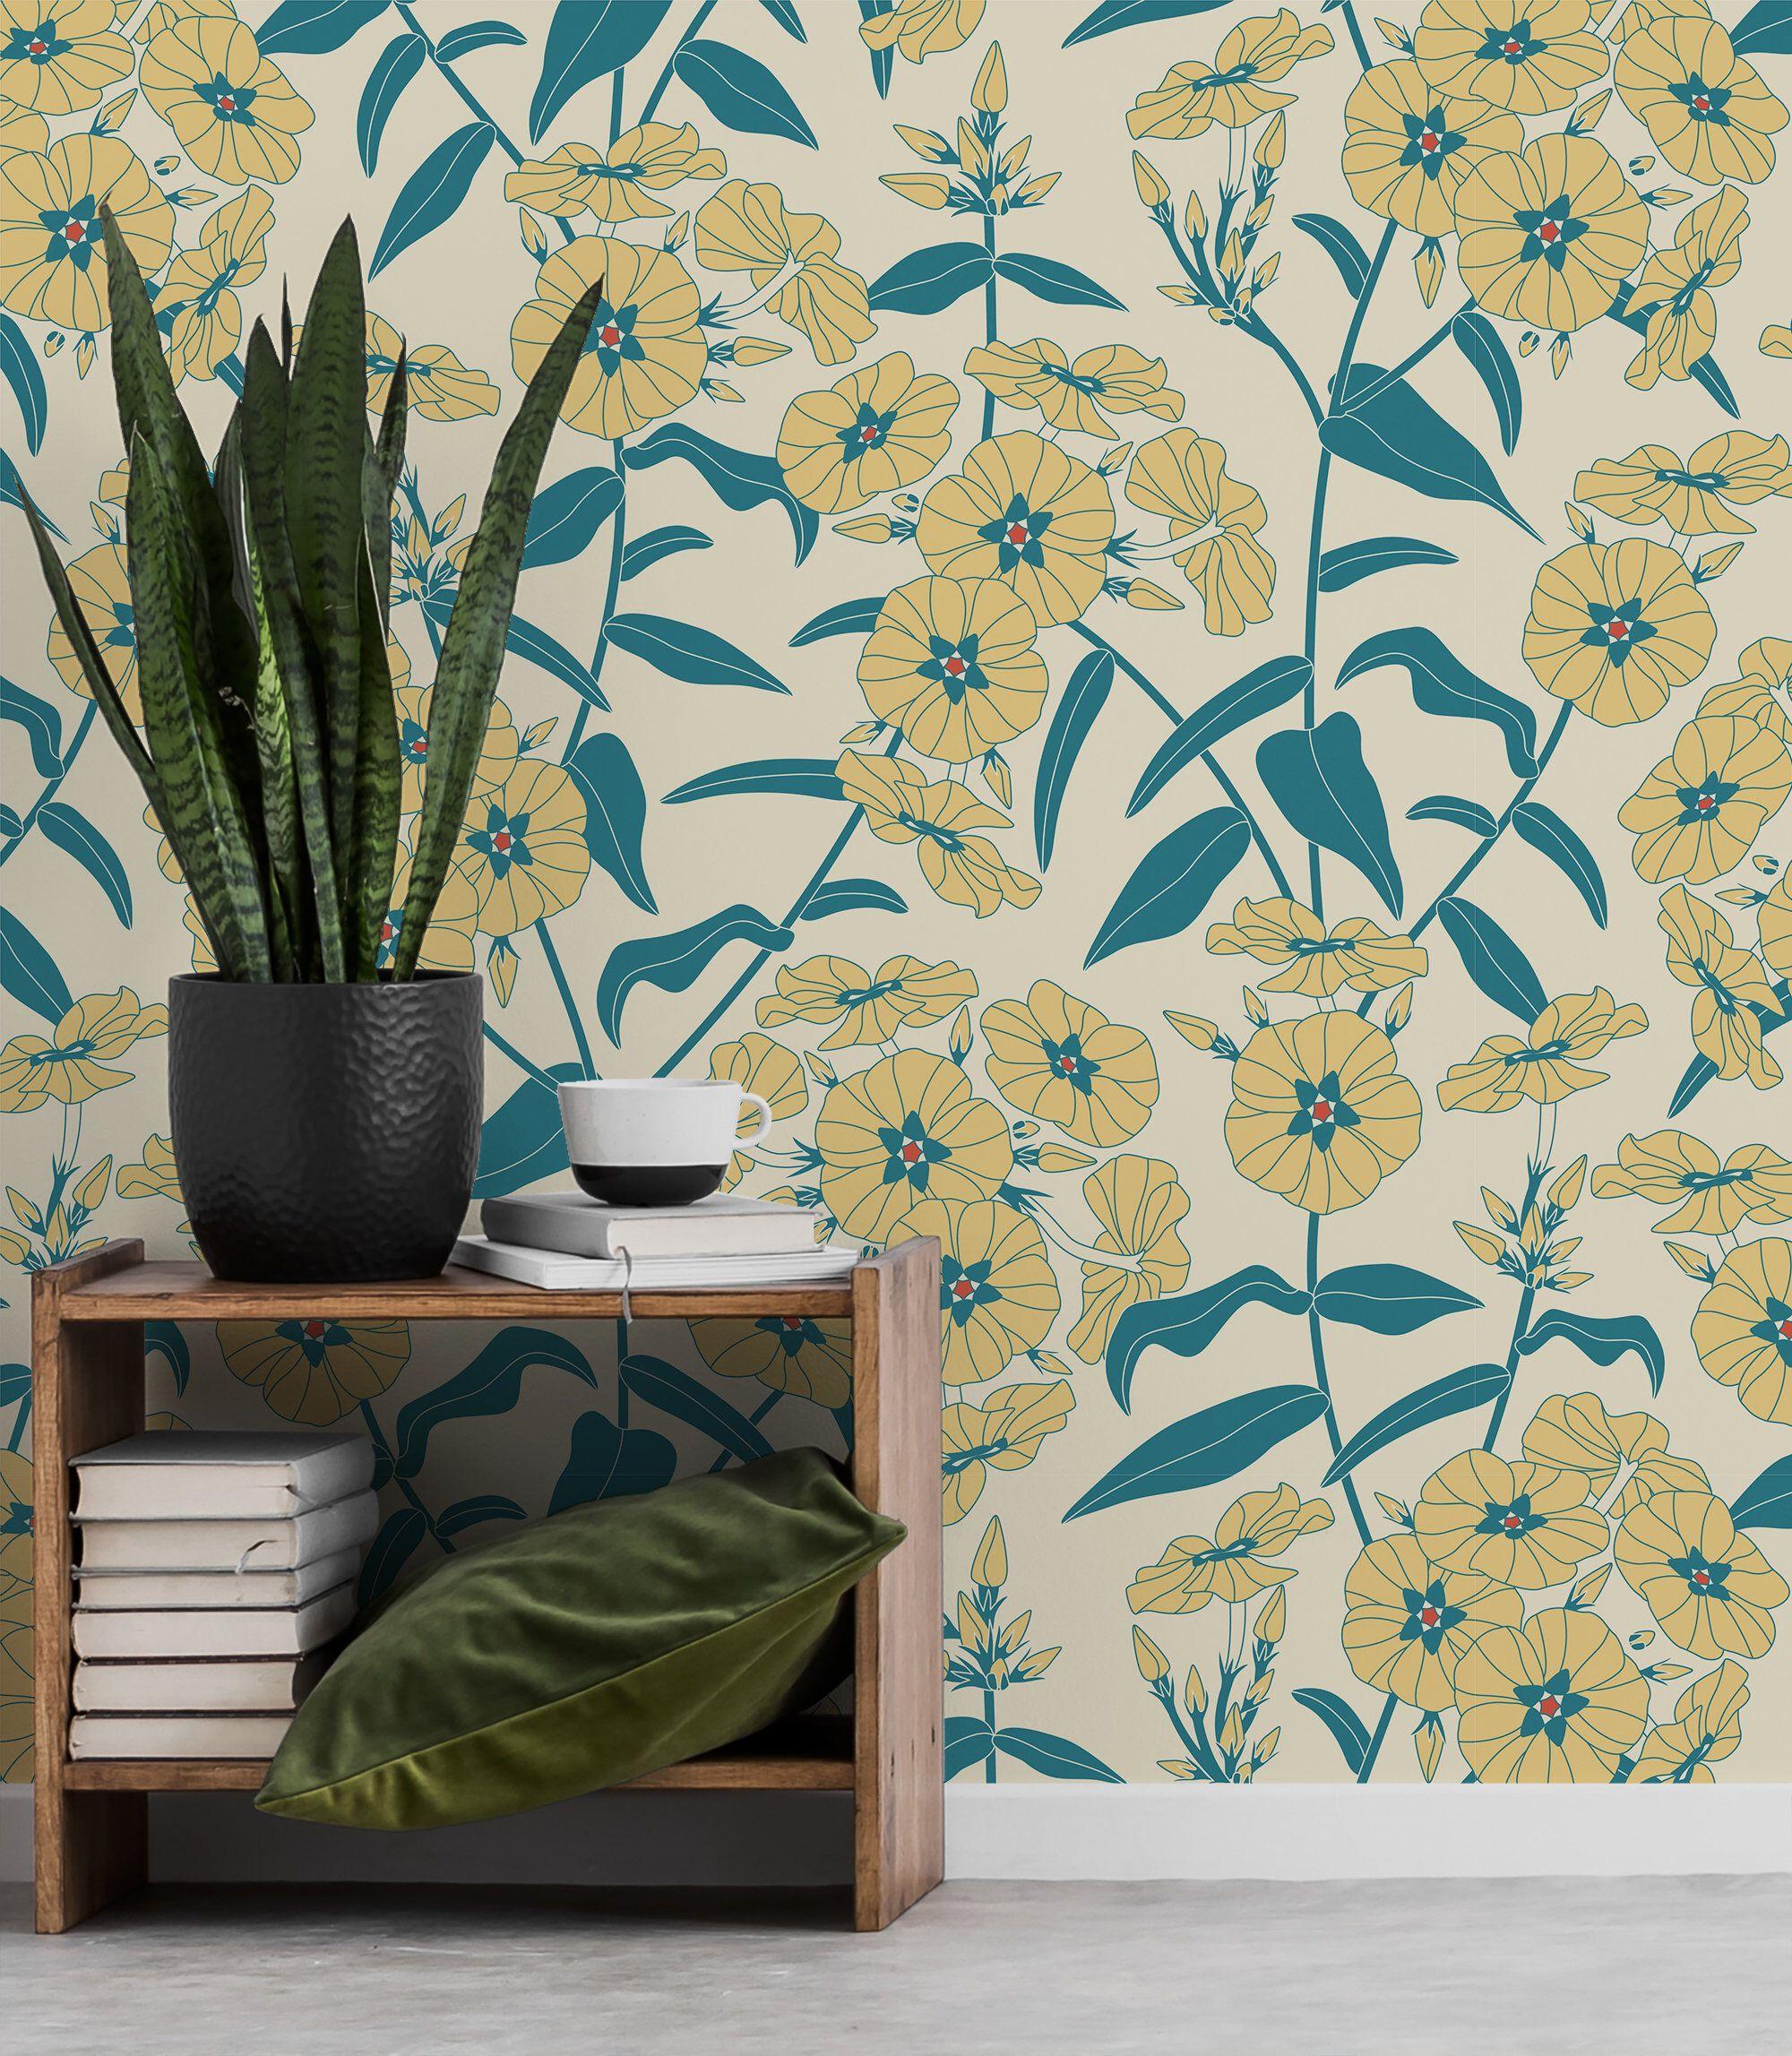 Yellow Flowers Vintage Wallpaper Self Adhesive Wall Mural Etsy Vintage Floral Wall Art Vintage Wallpaper Floral Wall Art